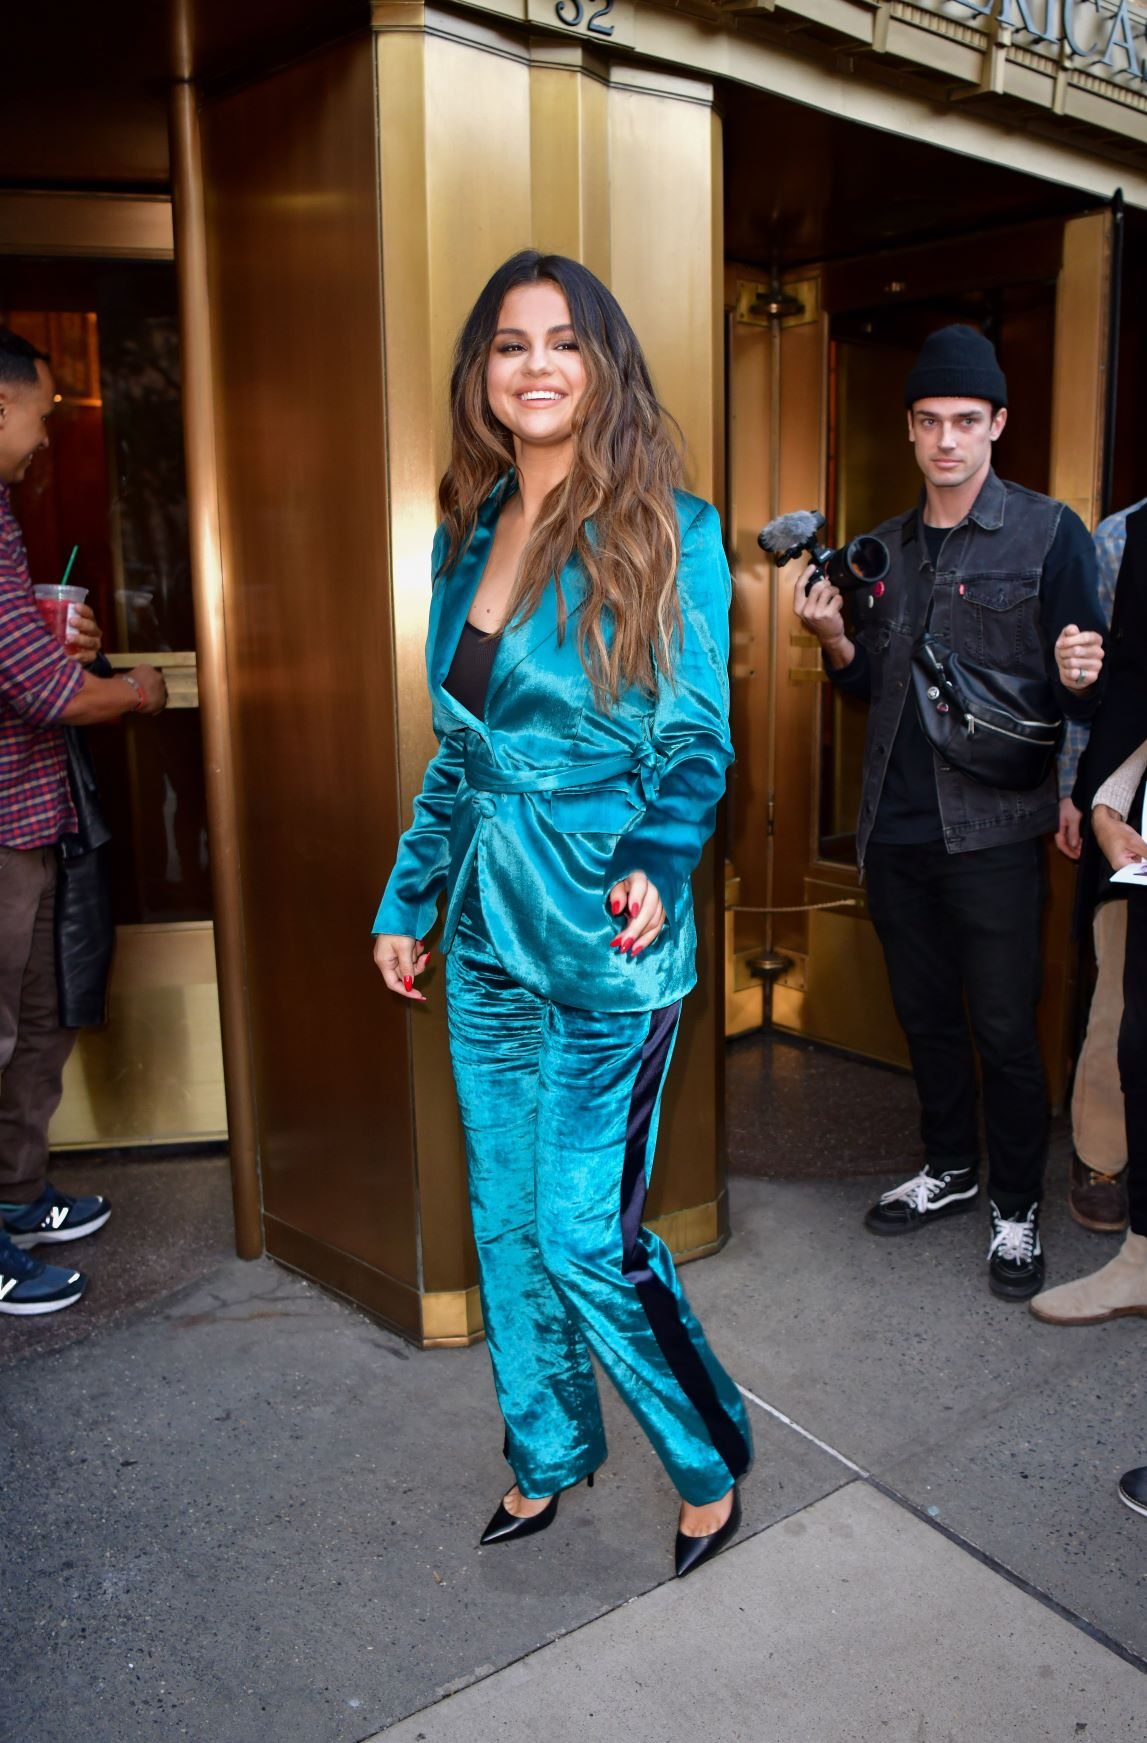 Selena suit xanh chất liệu lụa